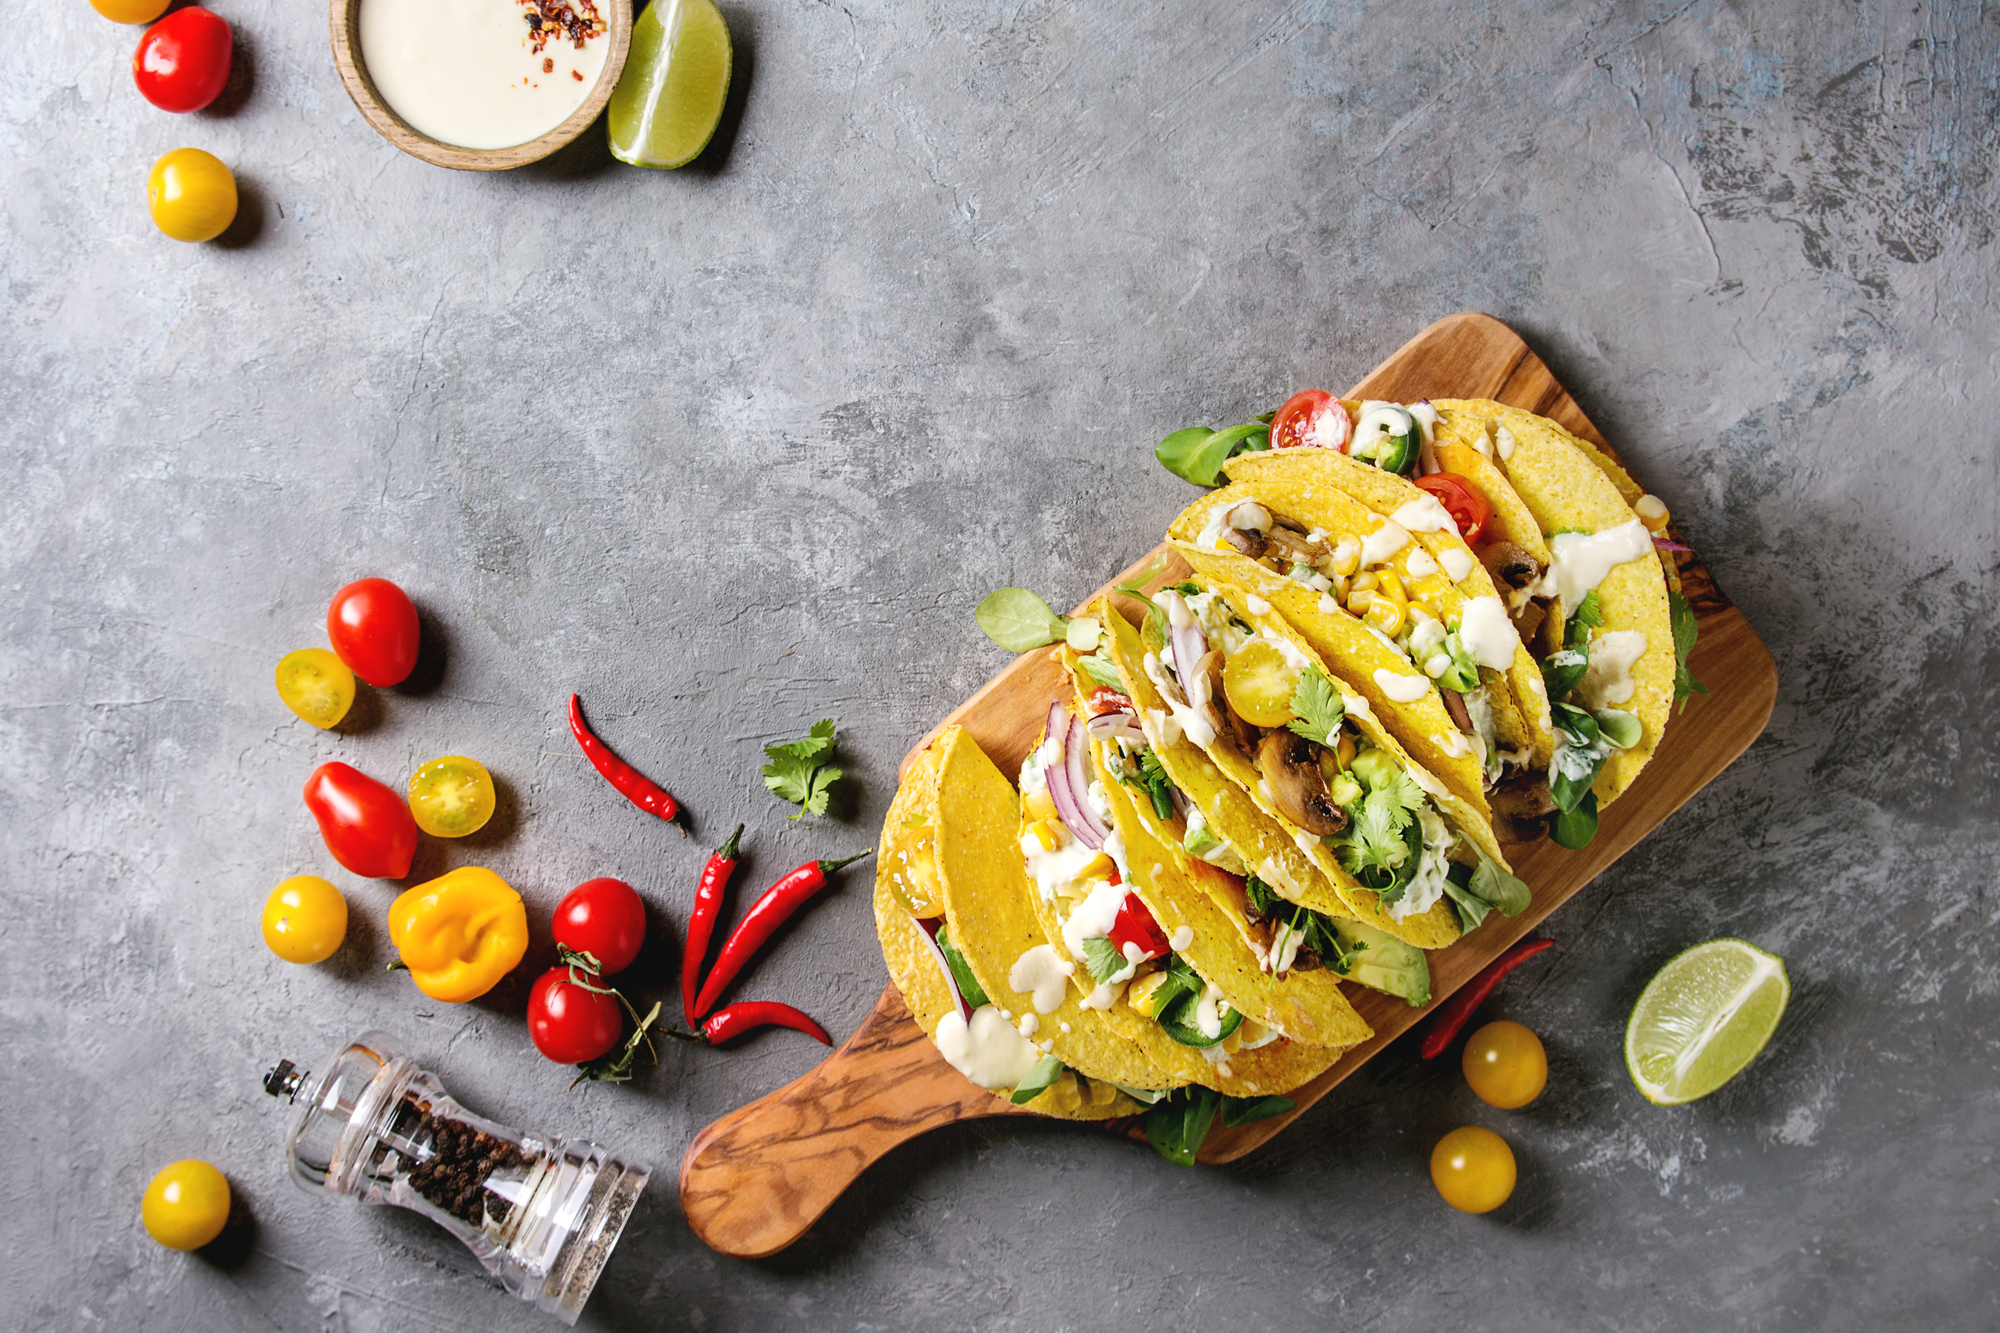 Depositphotos 198973358 l 2015 Portobello Tacos with Charred Scallion Salsa Verde